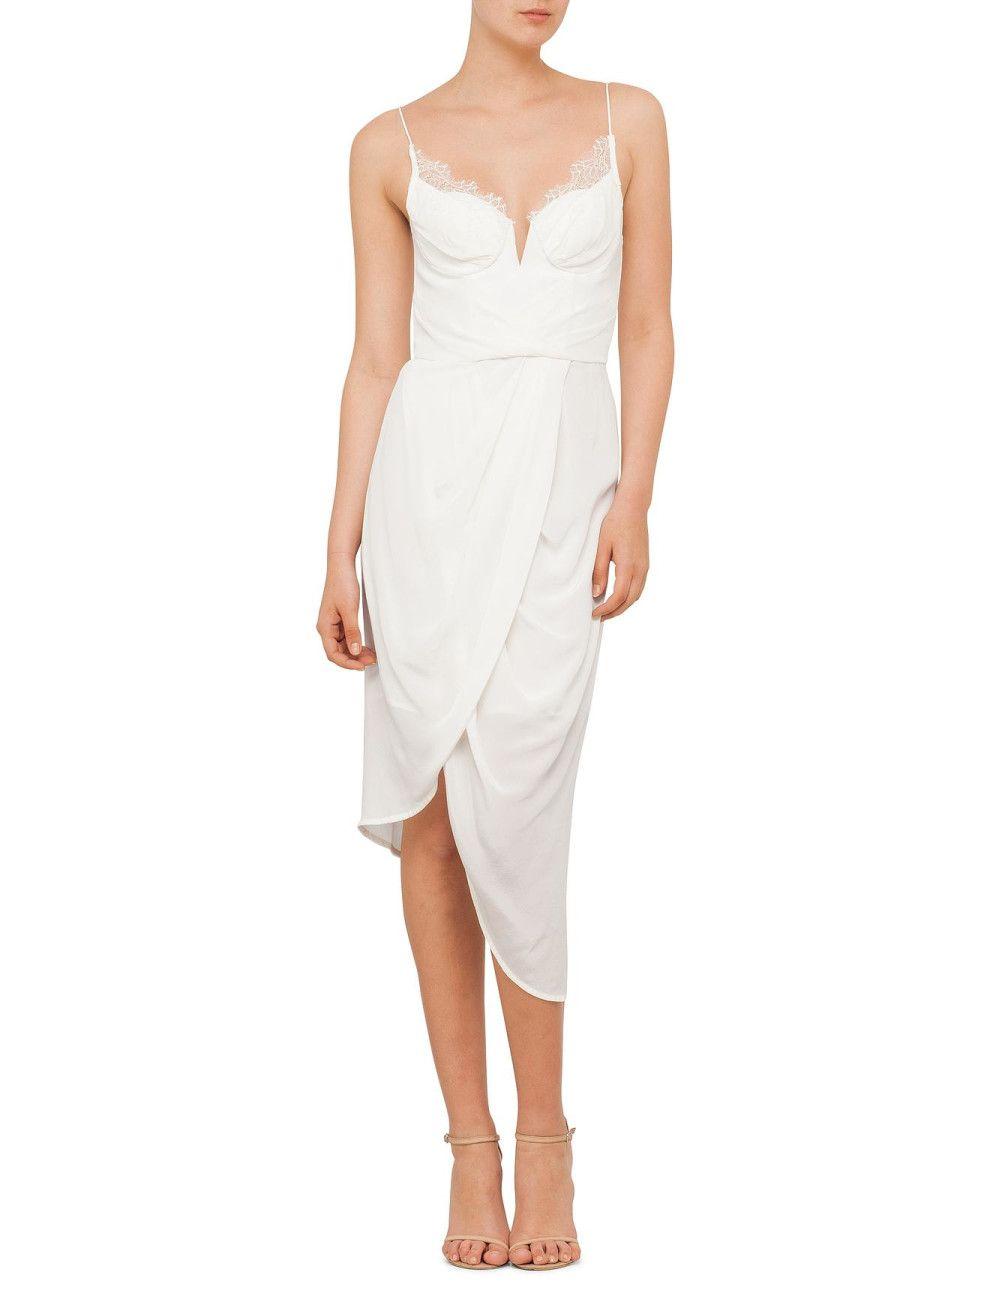 White dress david jones - Silk Lace Underwire Dress David Jones